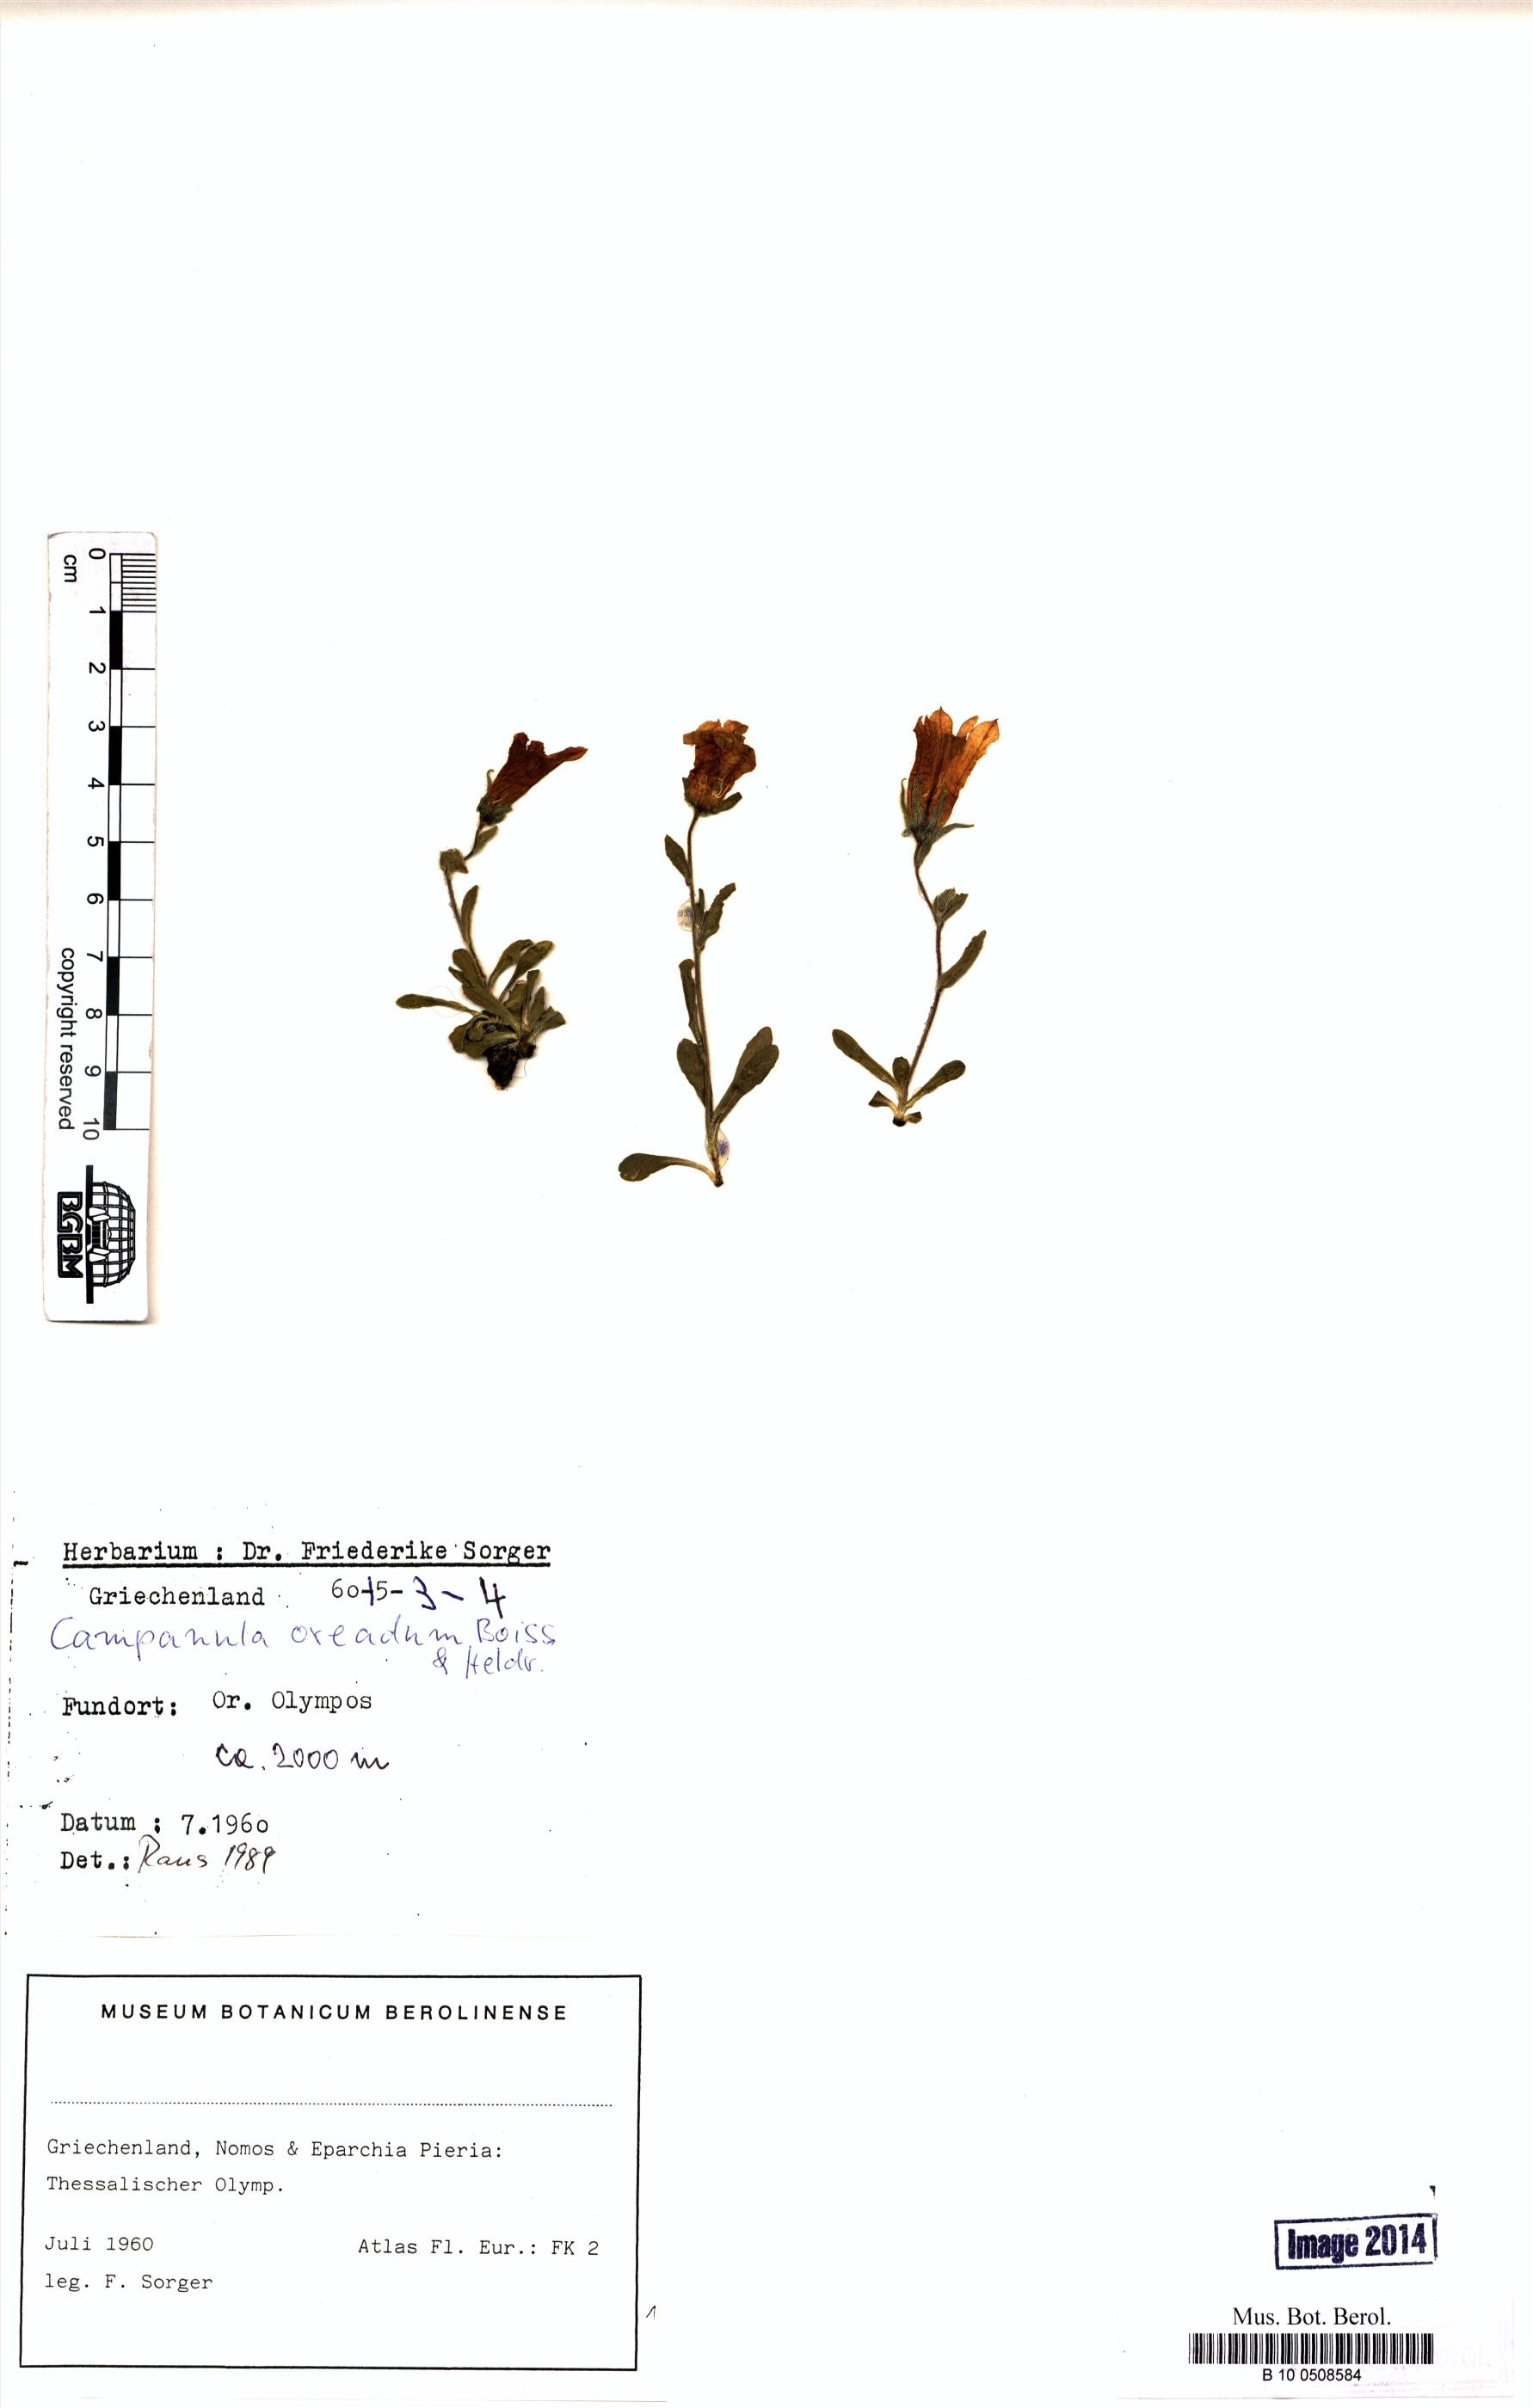 http://ww2.bgbm.org/herbarium/images/B/10/05/08/58/B_10_0508584.jpg